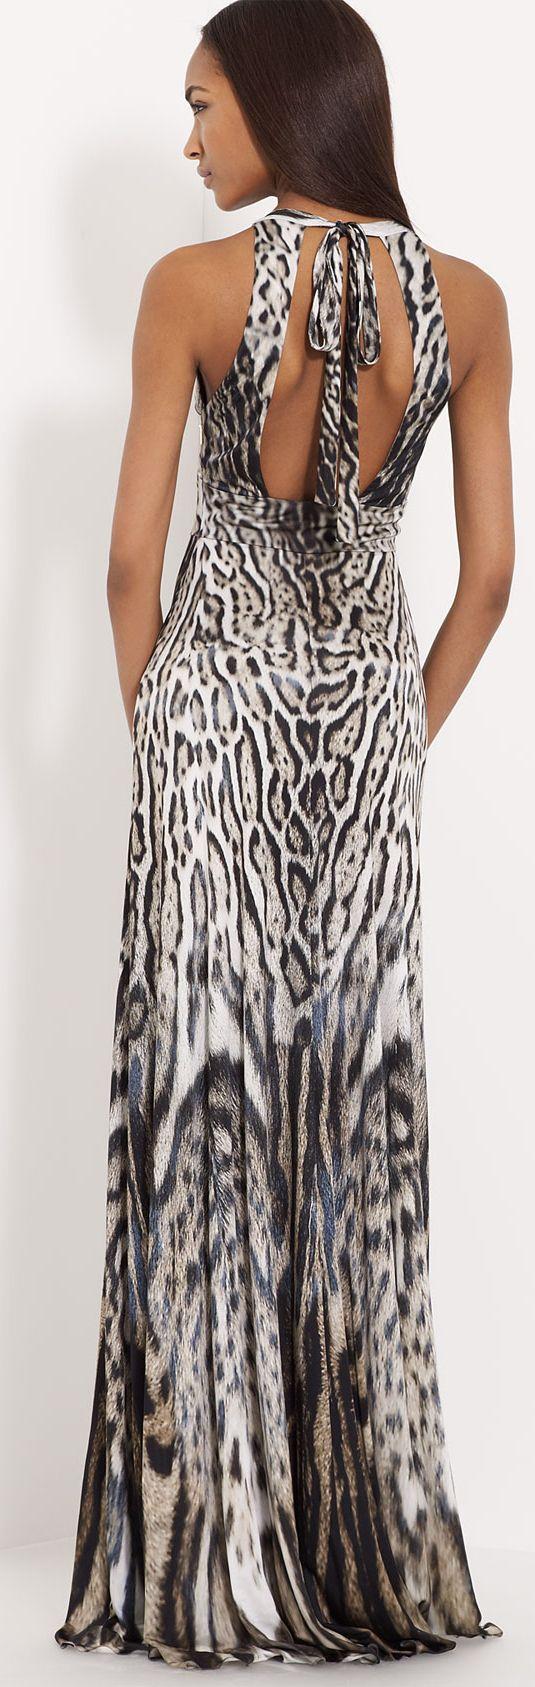 Roberto Cavalli Leopard Print Jersey Gown | Animal Prints ...